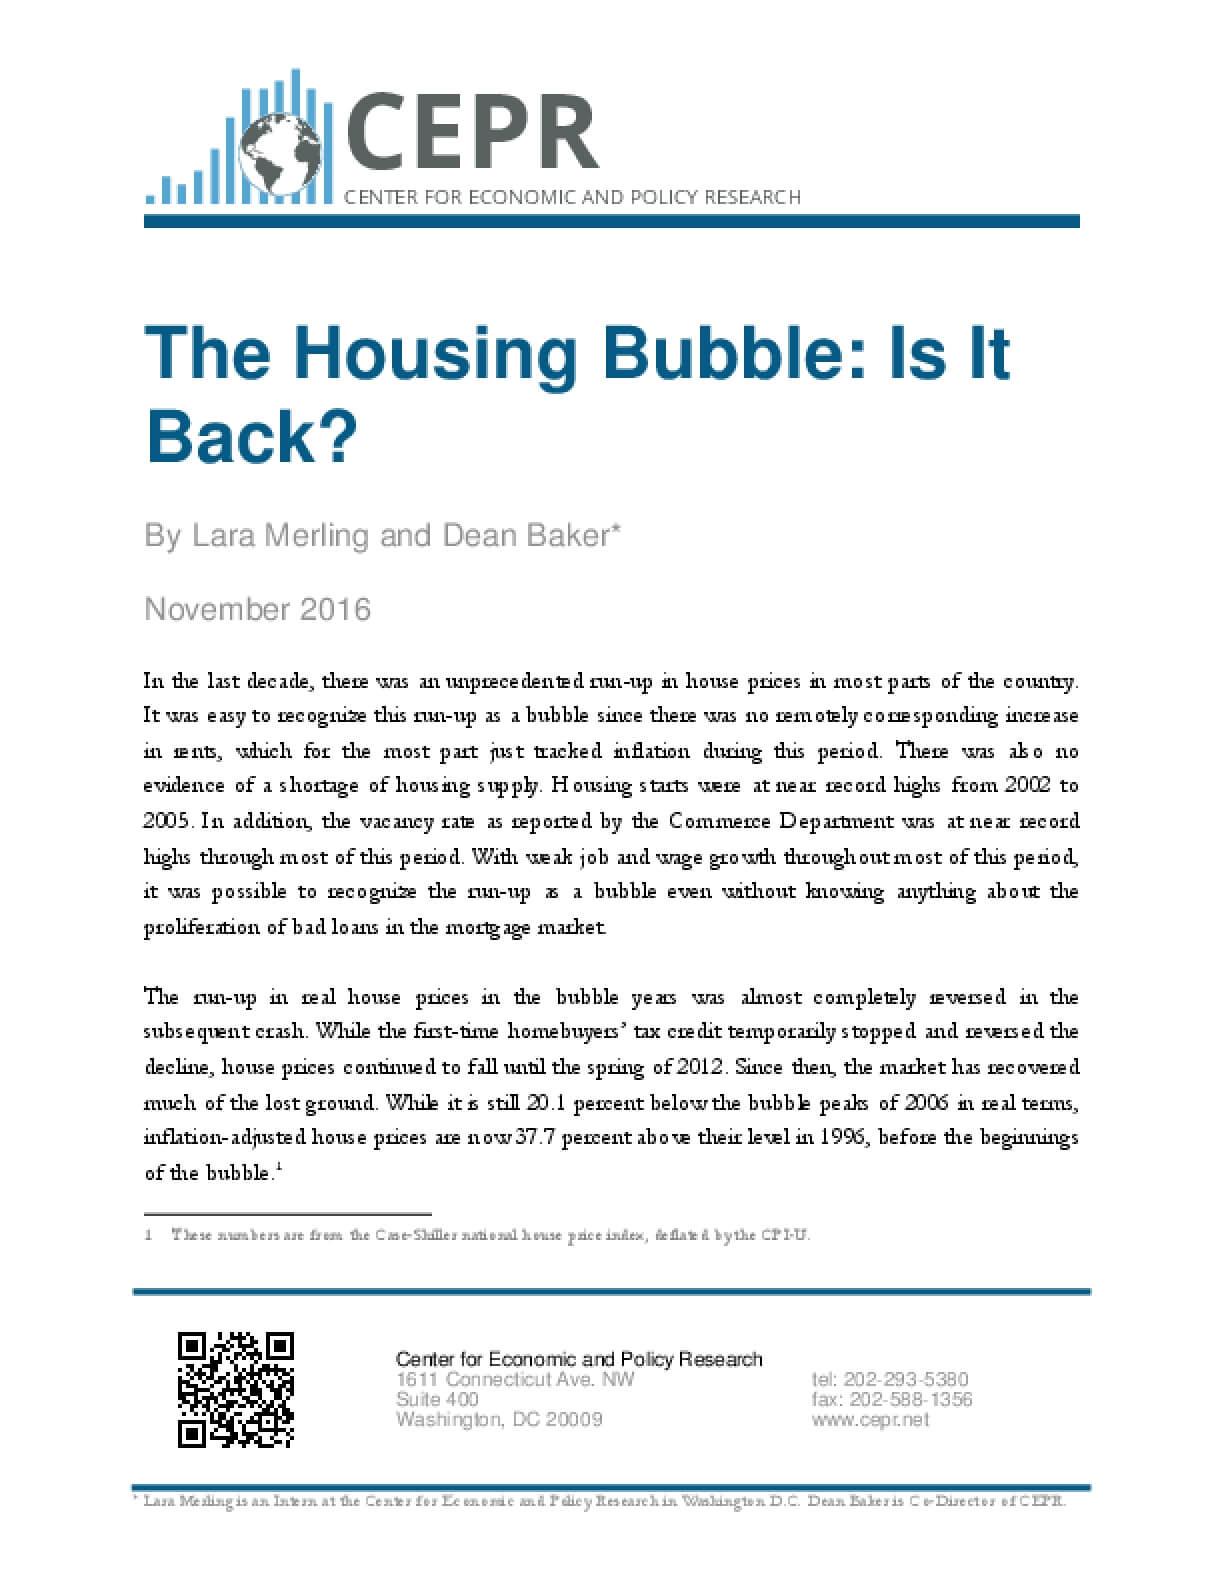 The Housing Bubble: Is It Back?